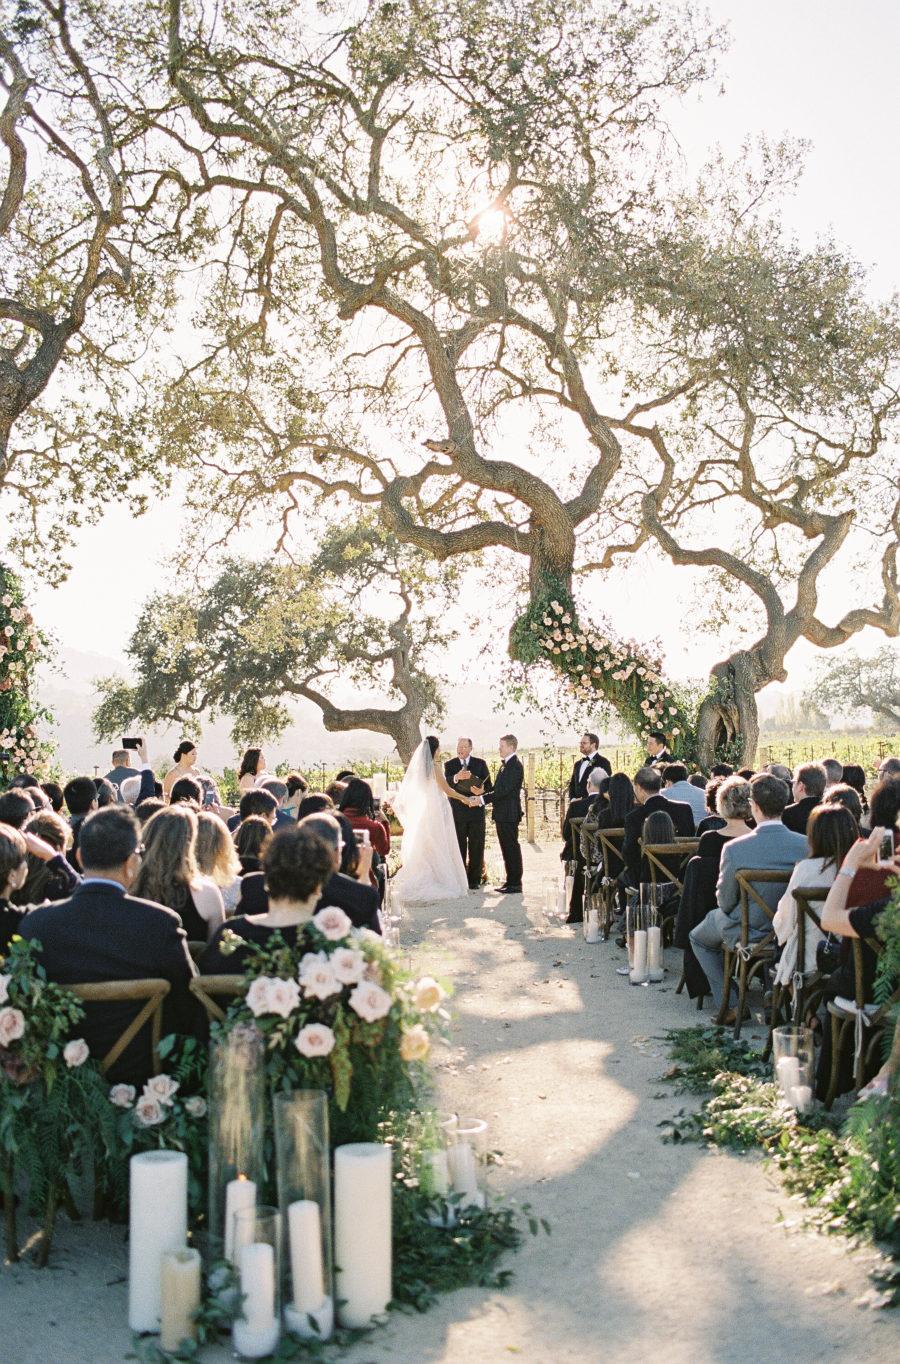 matrimonio-nel-bosco-drweddingideas